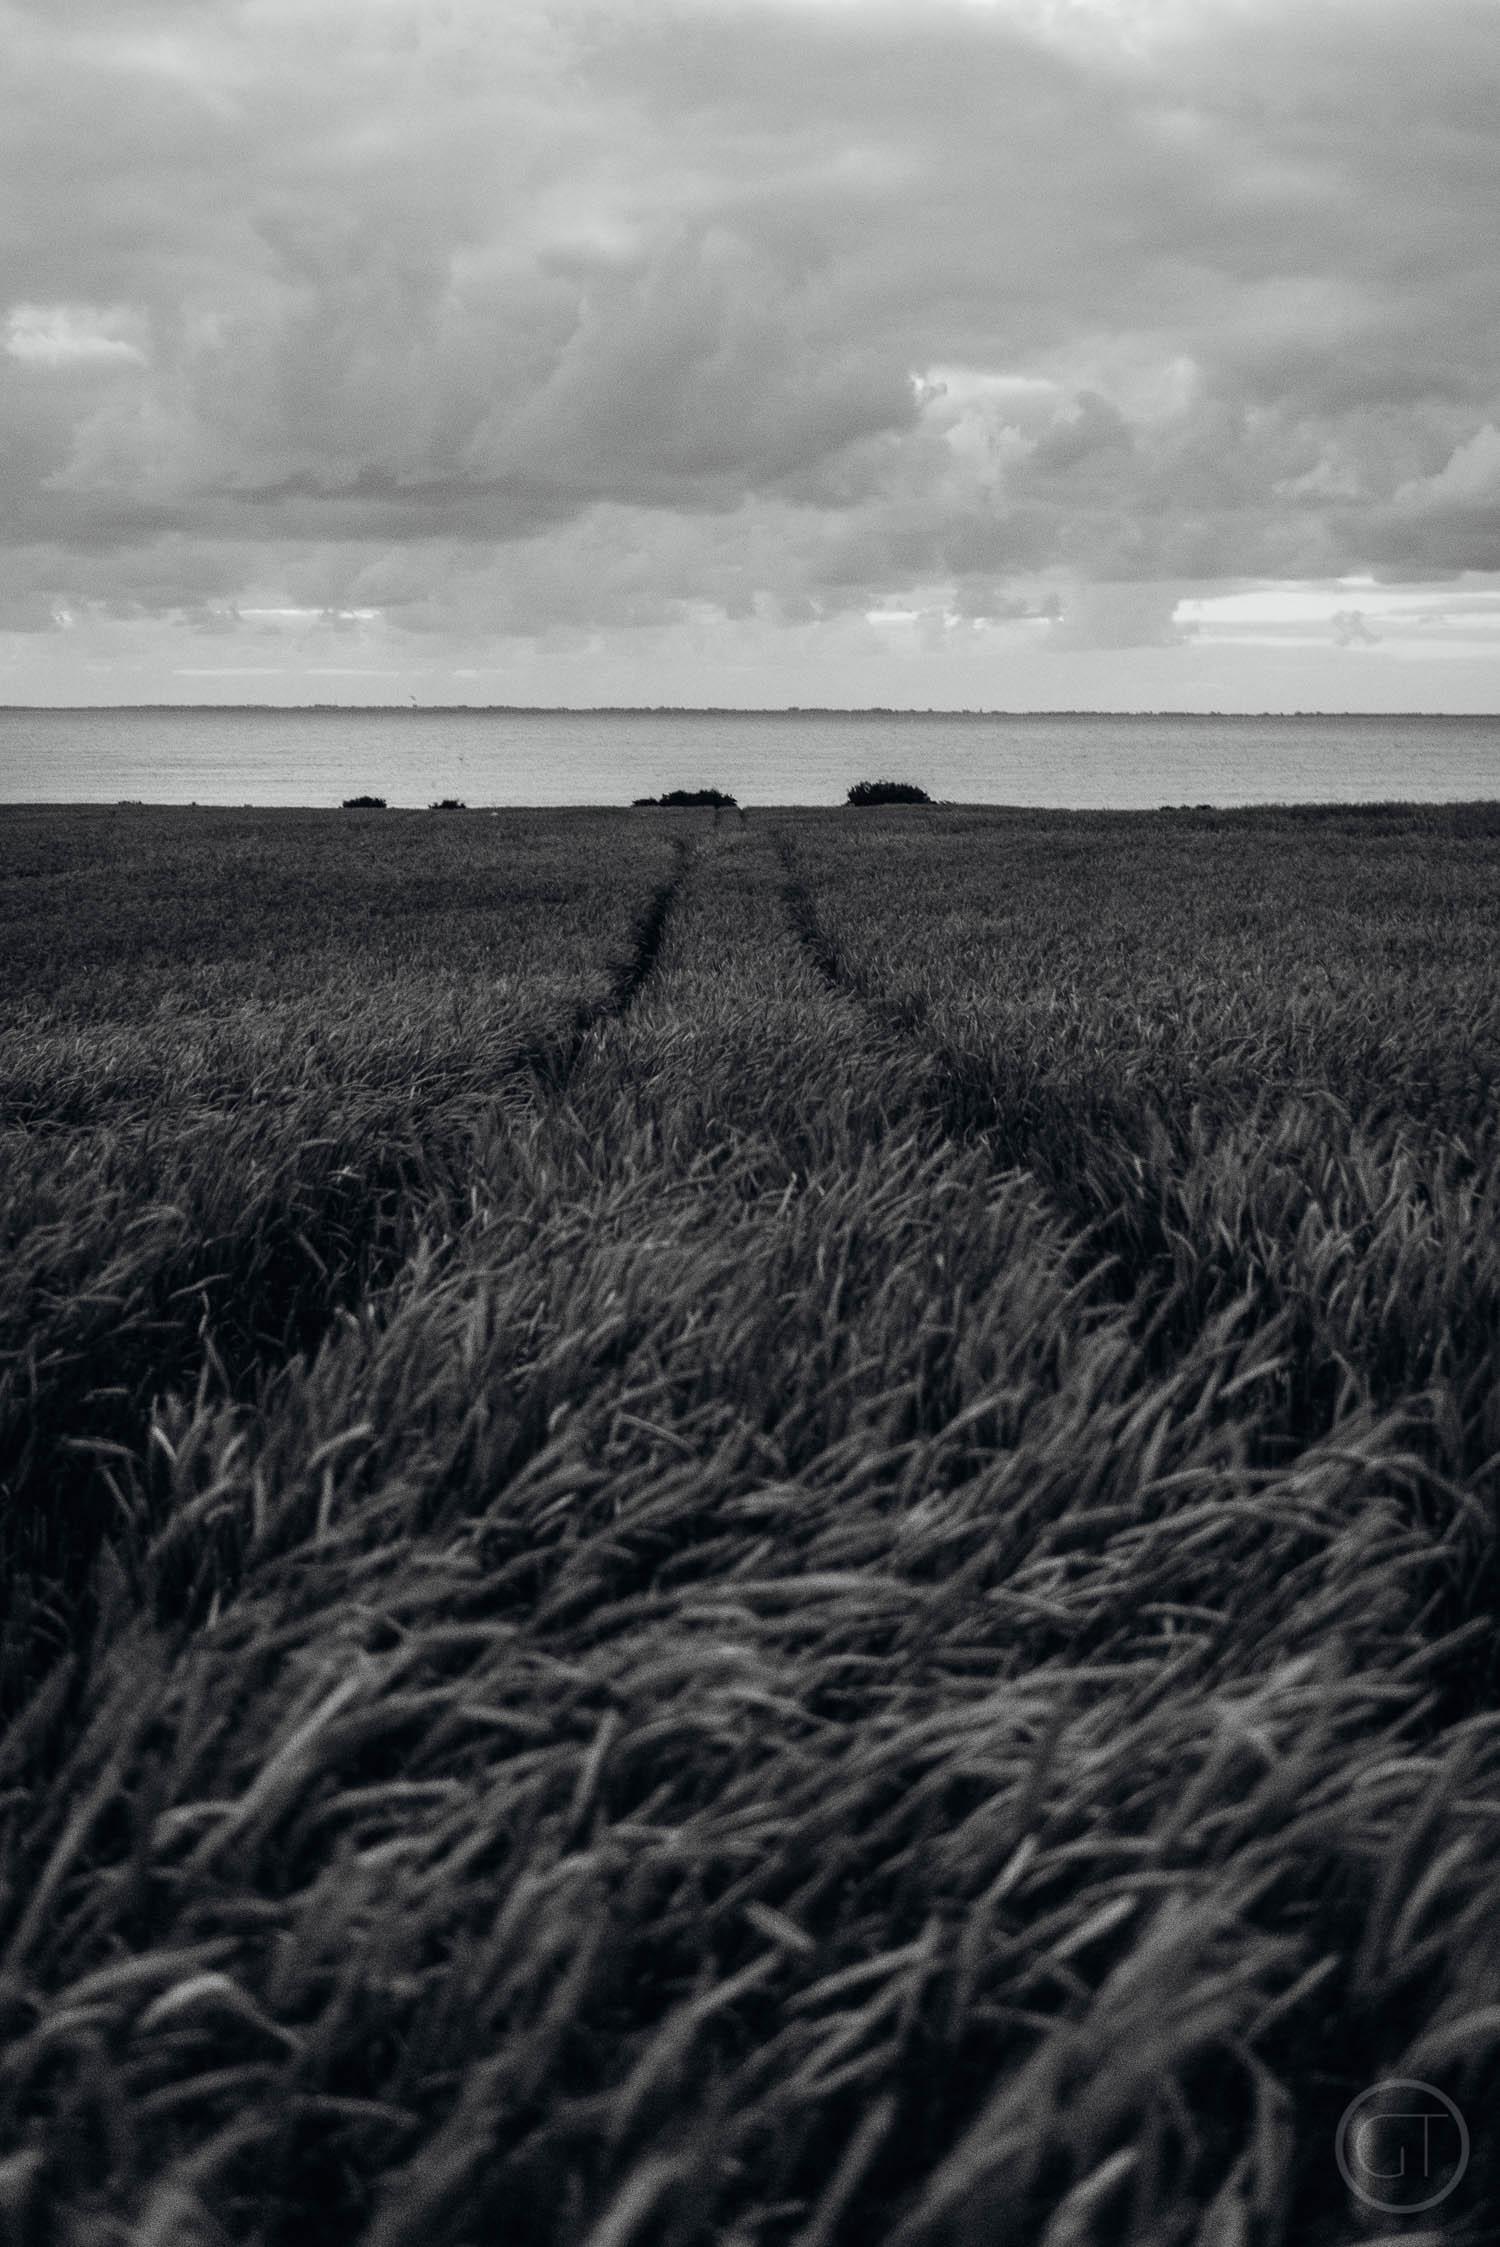 GUSTAV-THUESEN-DENMARK-COAST-PHOTOGRAPHER-VIDEO-NATURE-ADVENTURE-OUTDOOR-LIFESTYLE-2.jpg